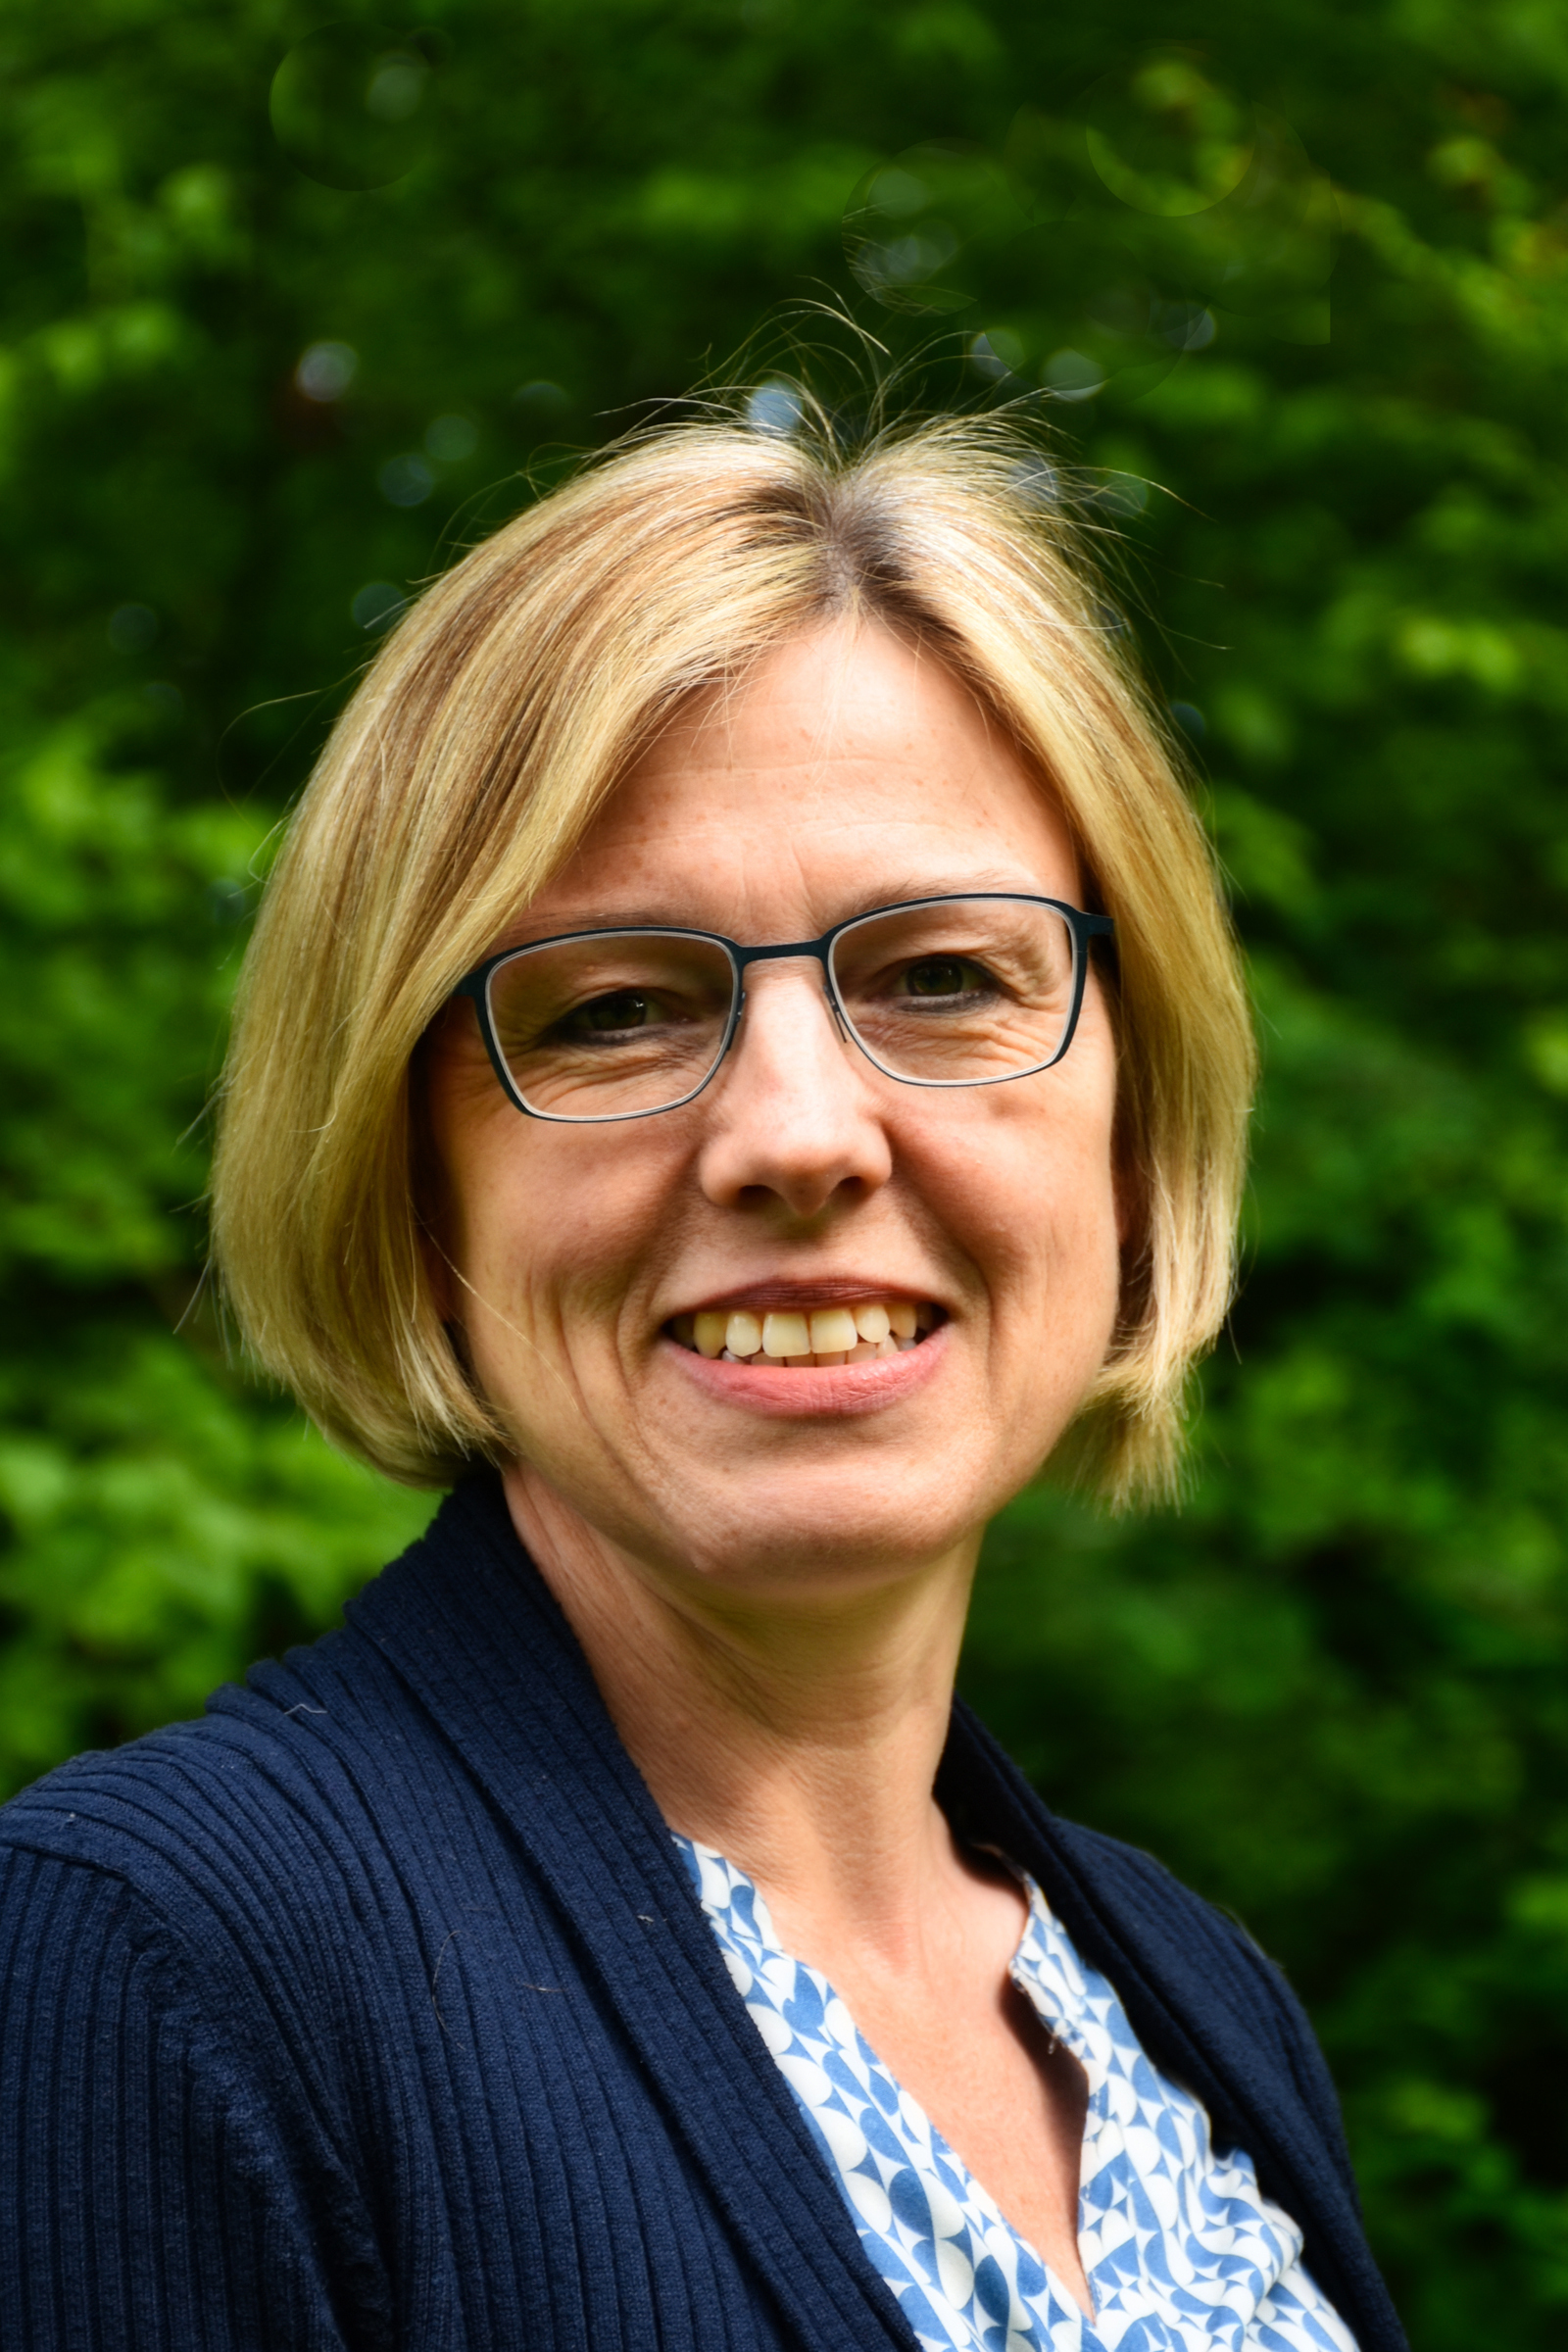 Sonja Kiehl